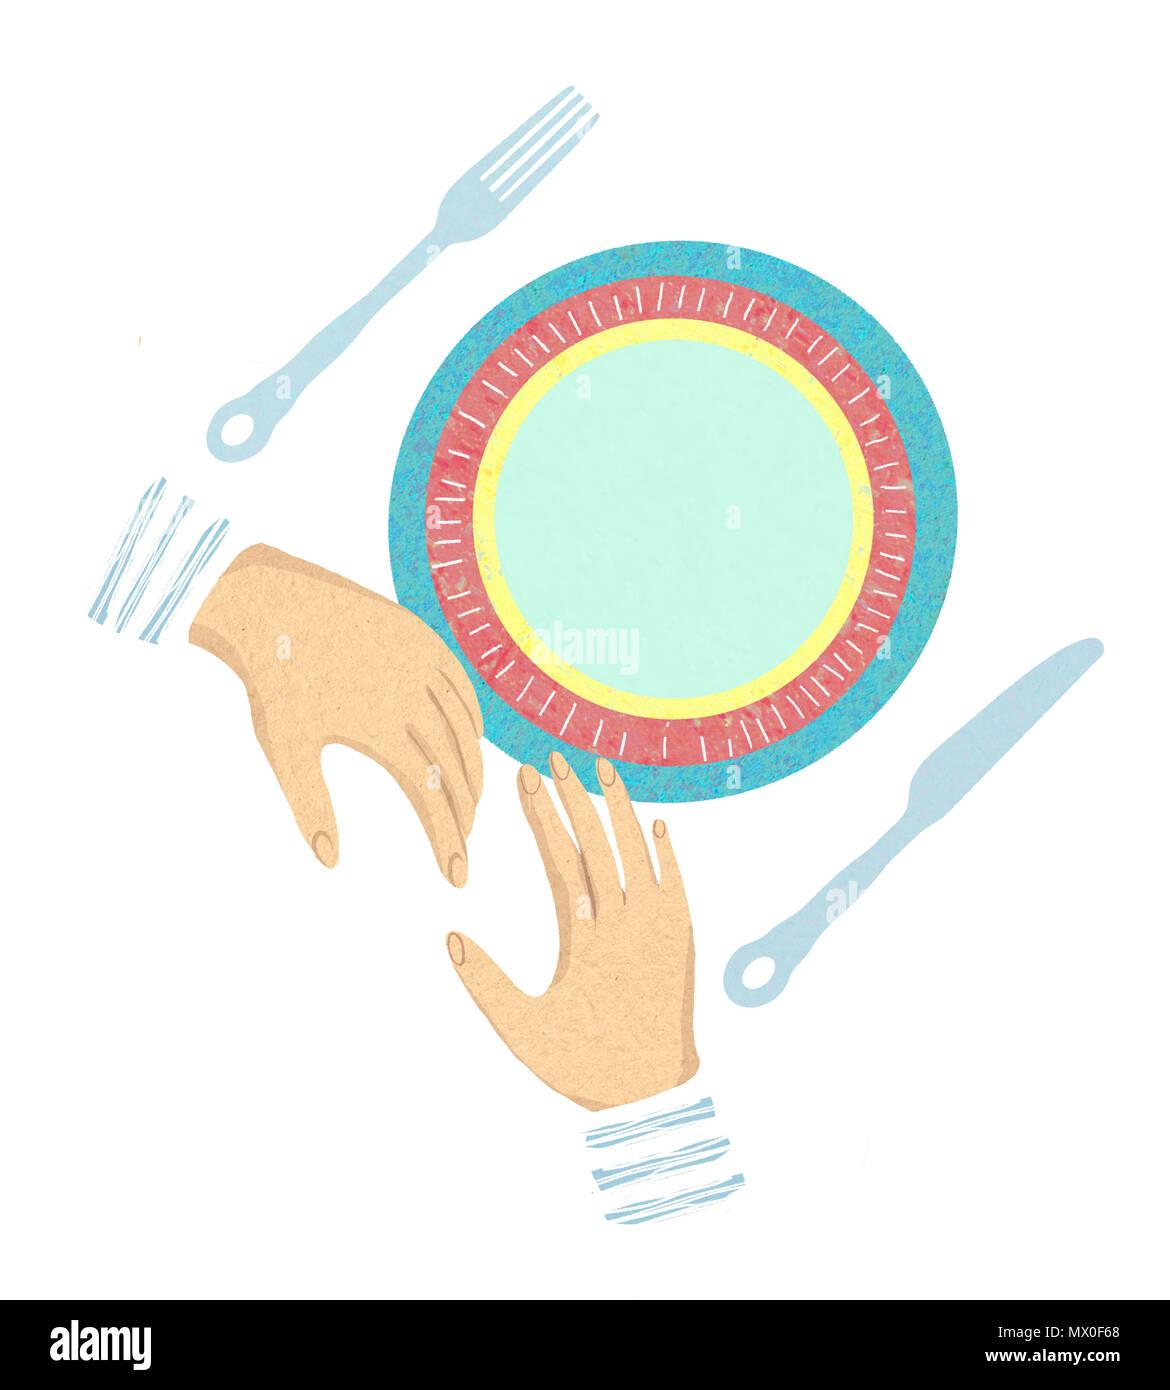 Cutlery etiquette. Restaurant etiquette. Forks and knifes signals. Table manner. Dining etiquette Stock Photo